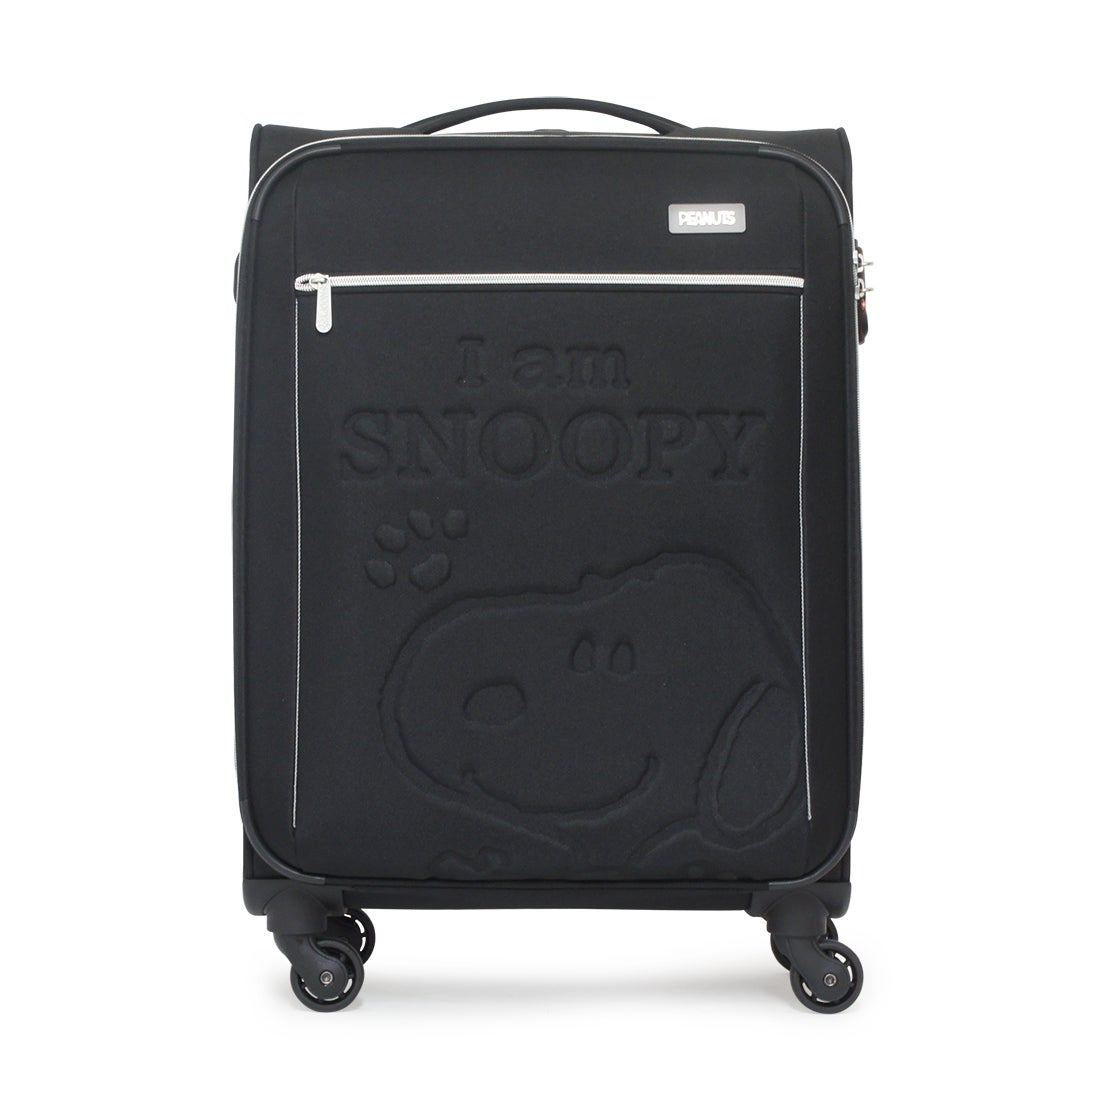 【SAC'S BAR】スヌーピー SNOOPY ソフトキャリーケース PN-006 54cm BLACK レディース